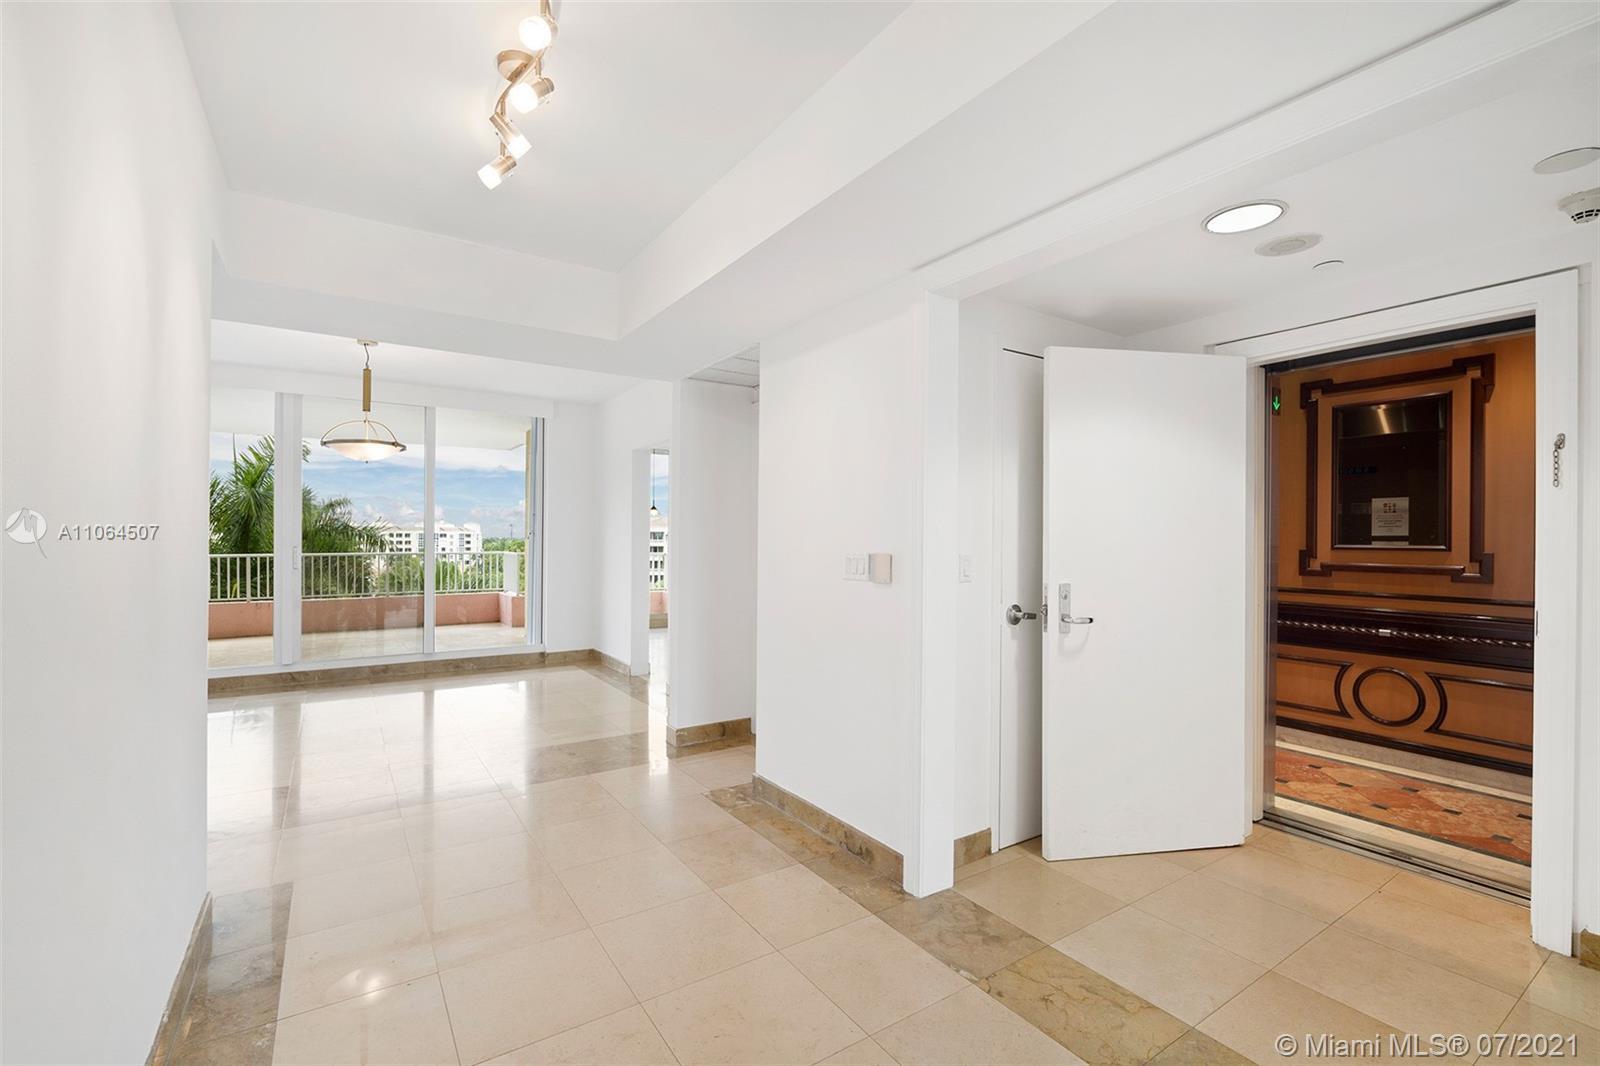 785 Crandon Blvd Unit 505 - Foyer with Private Elevator Entrance